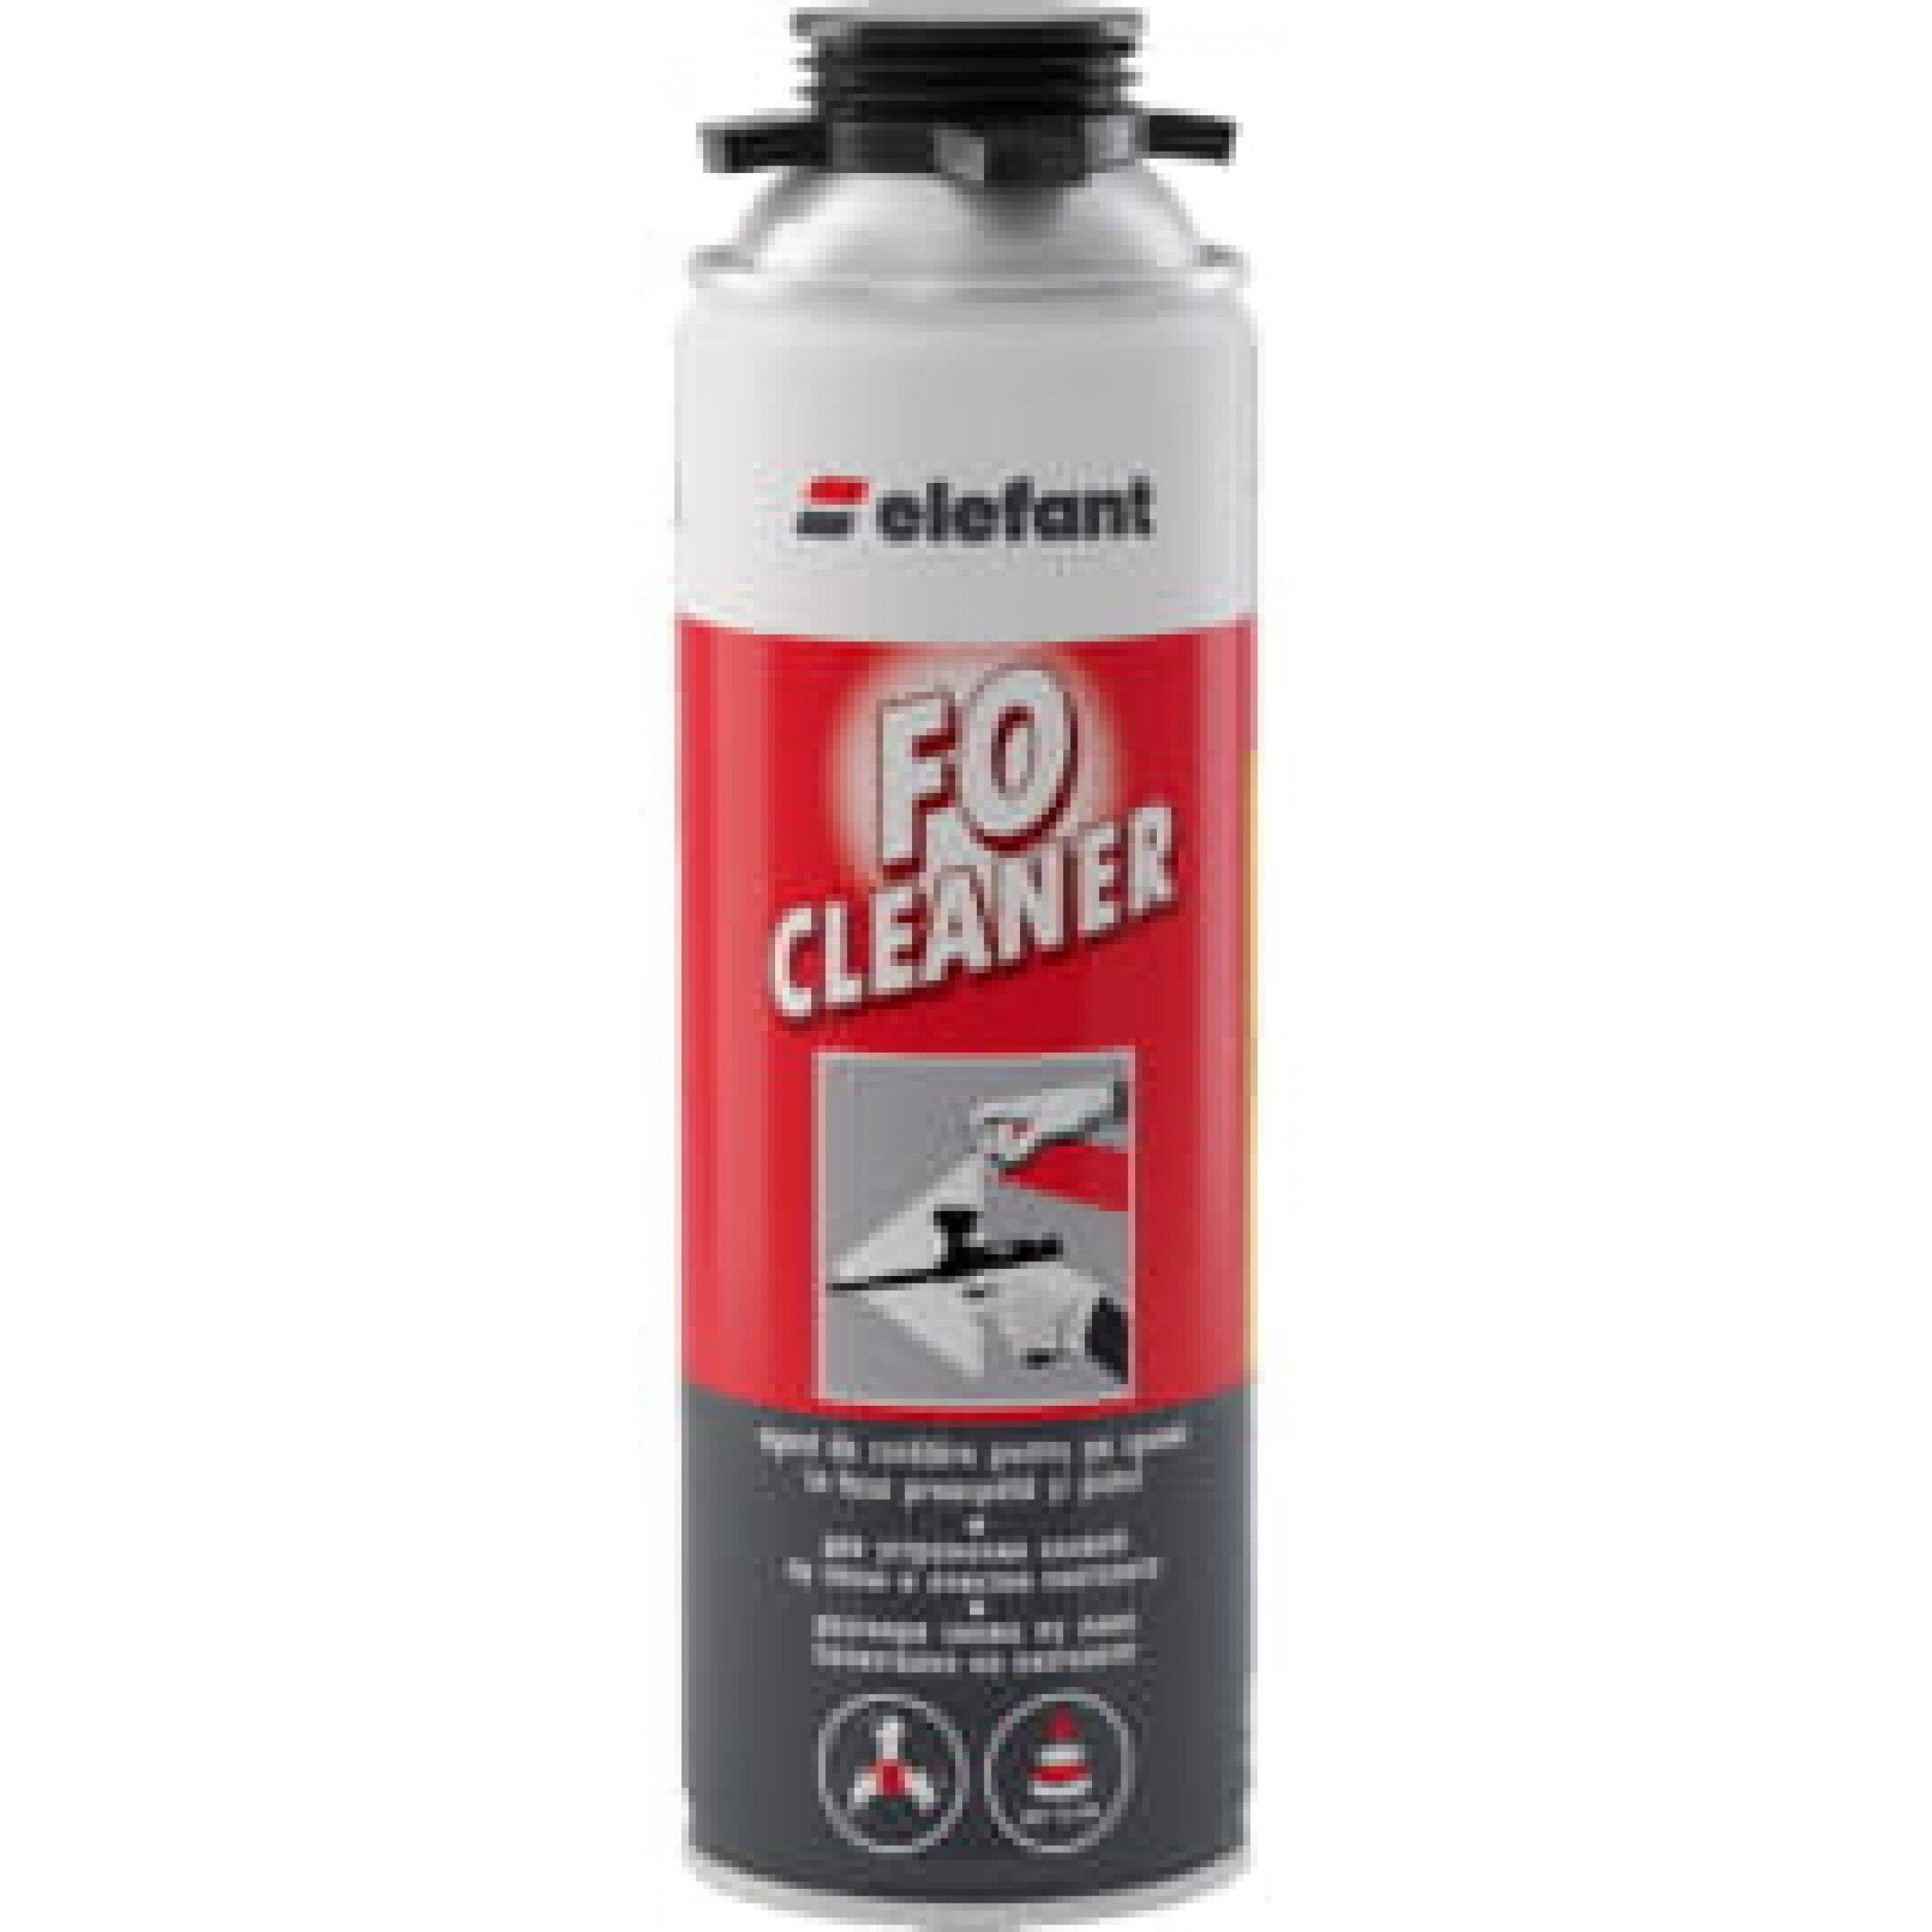 Elefant FO-Purificator (FO-Cleaner) 500ml